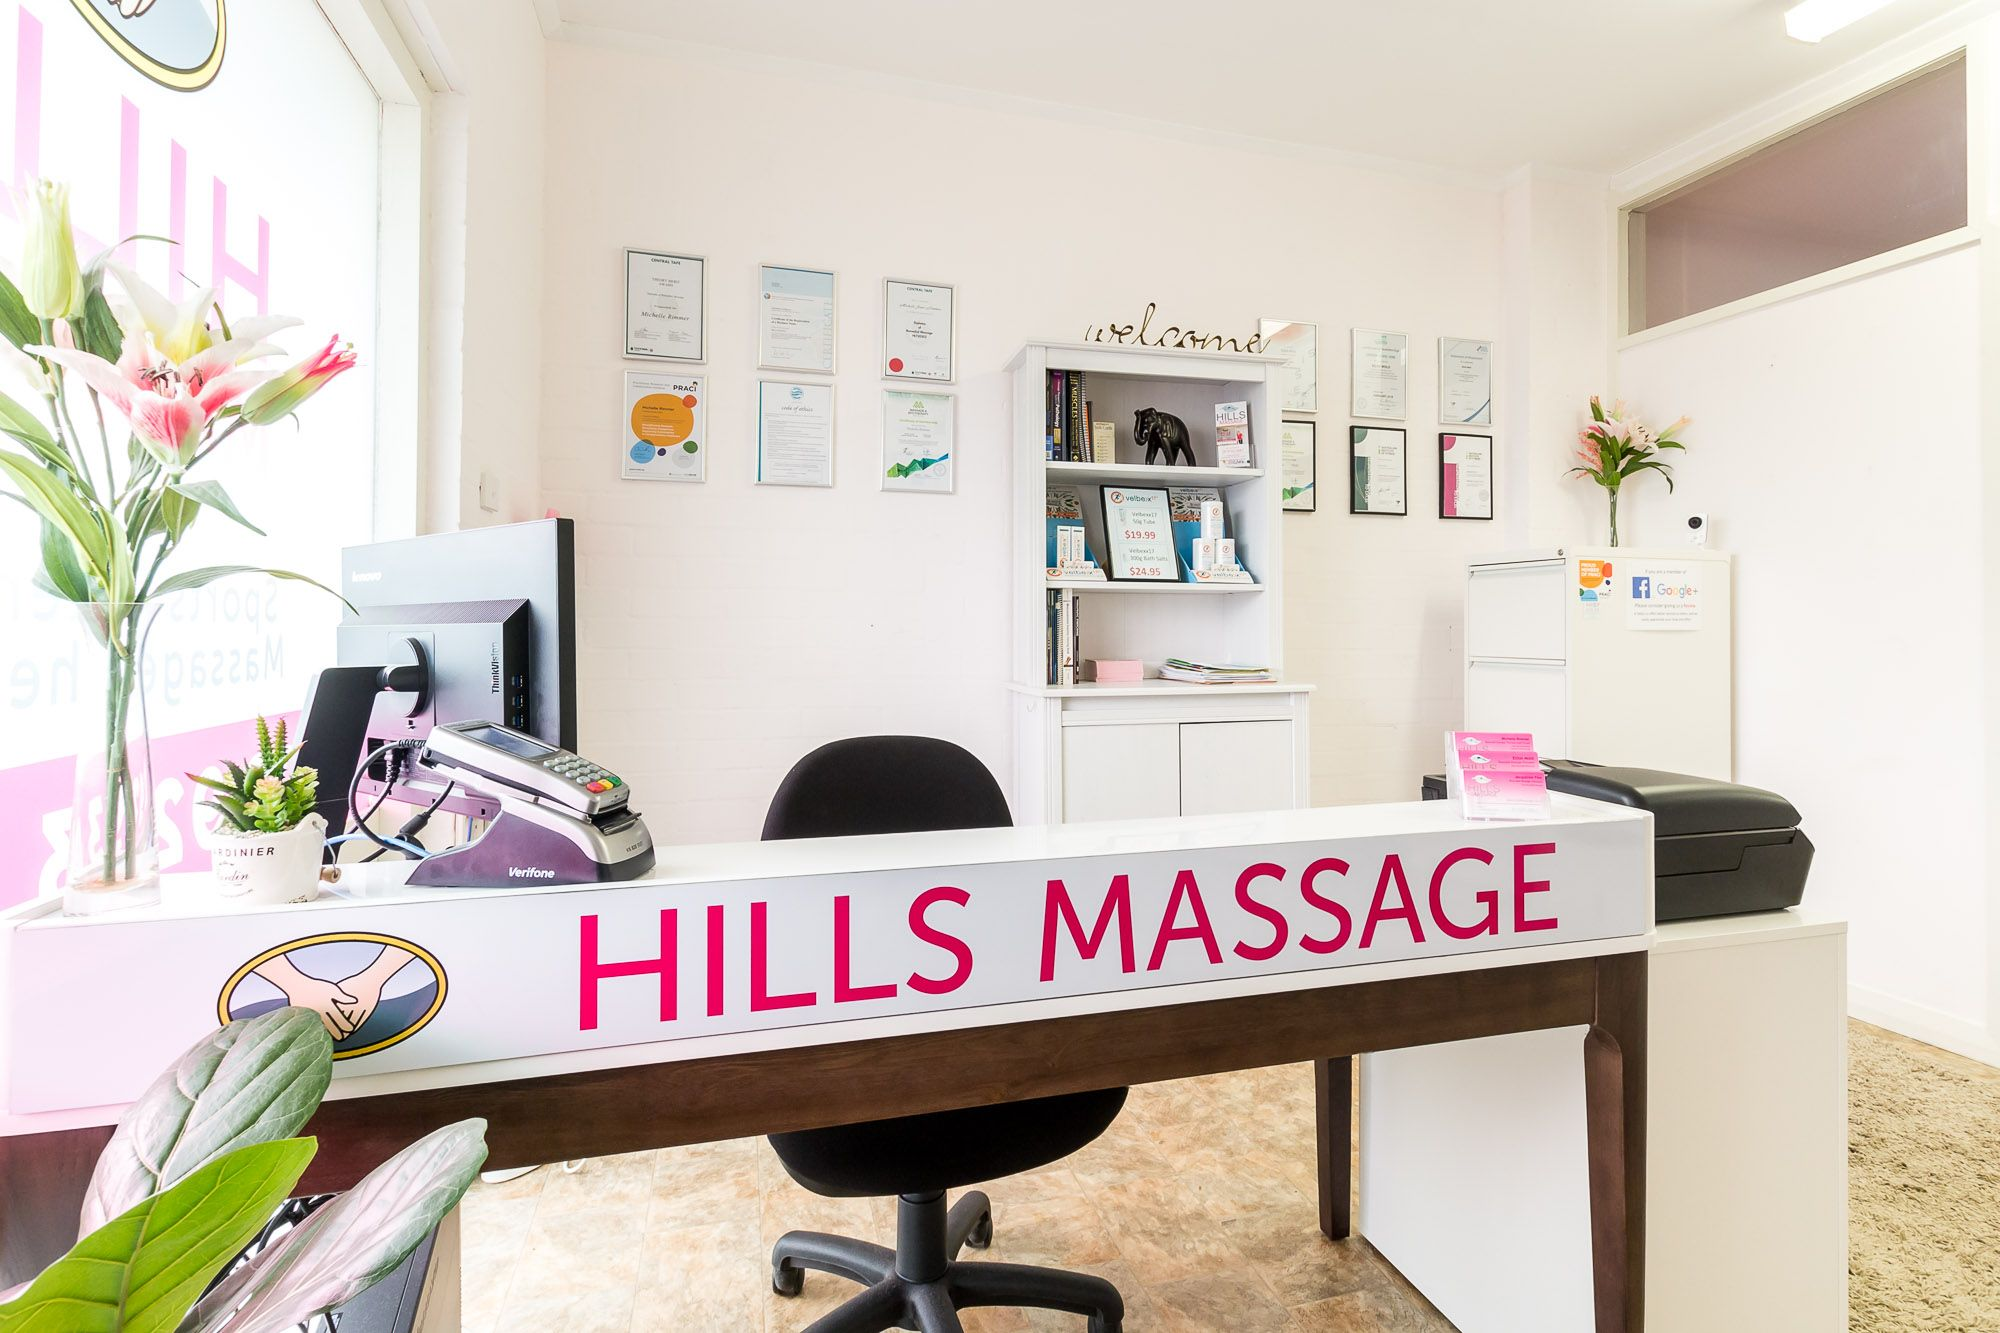 The reception desk at Hills Massage